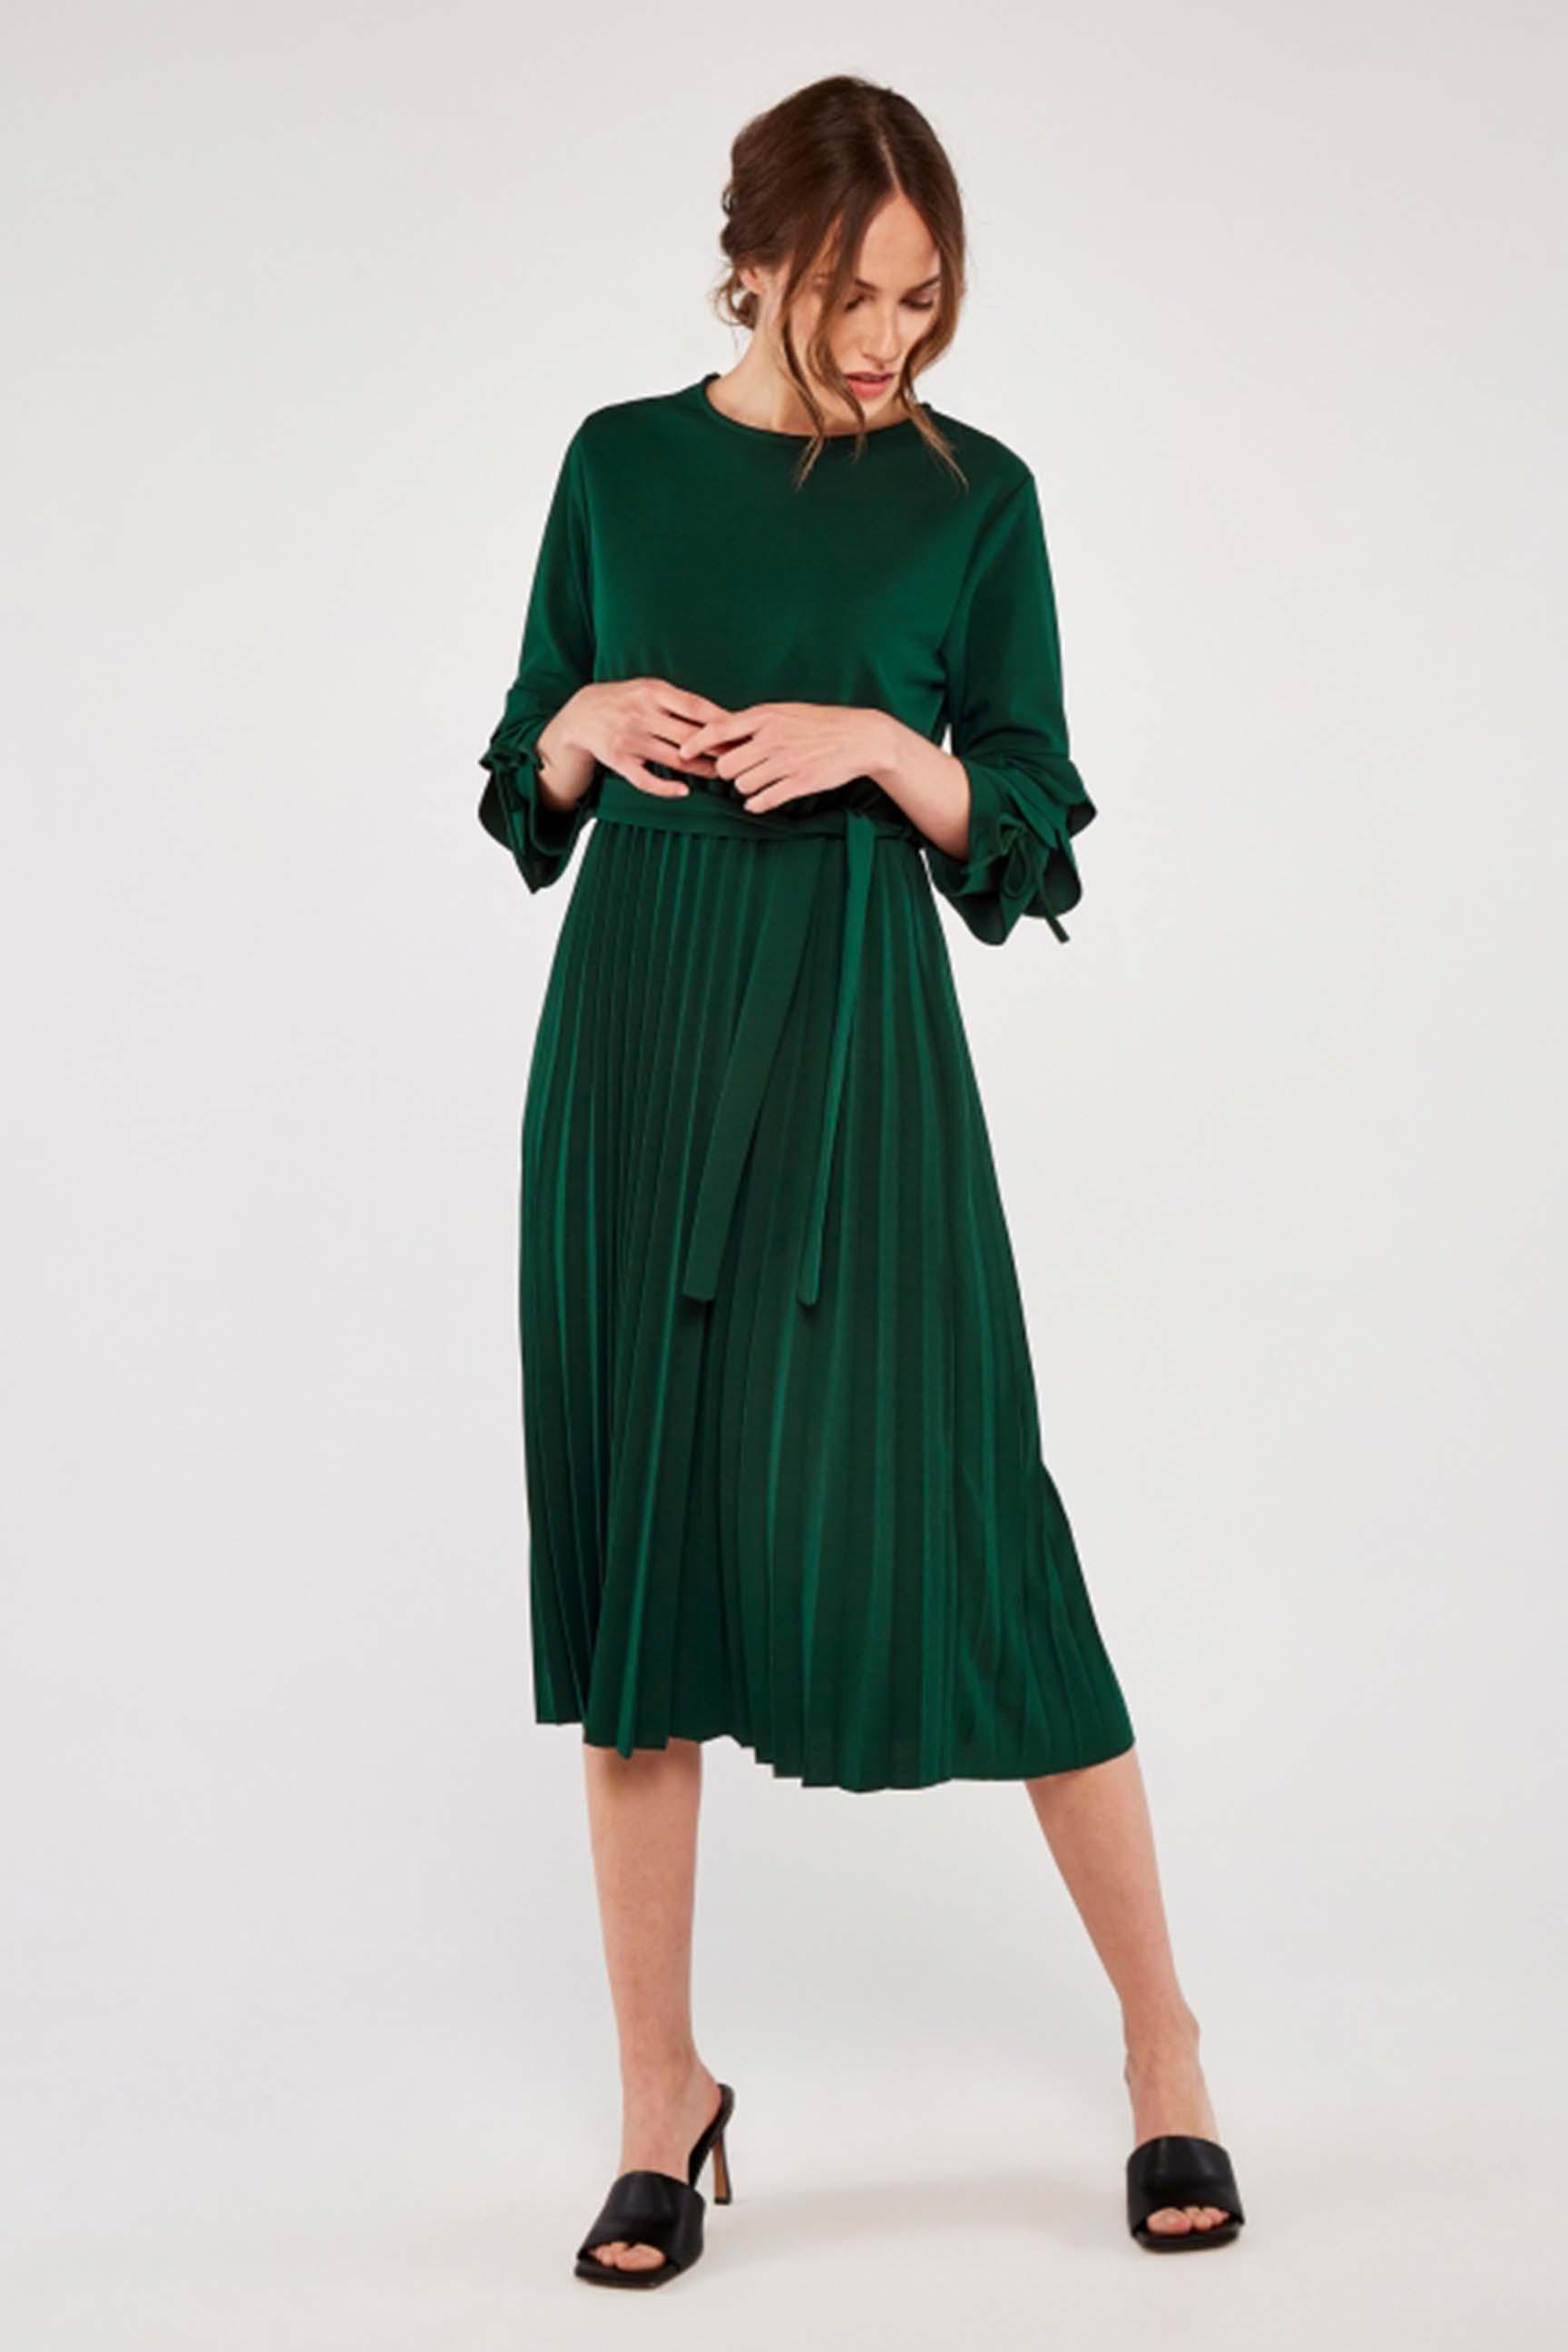 Apricot Damen Kleid Green Pleat Ruffle Sleeve Midi Dress Tayler Fashion